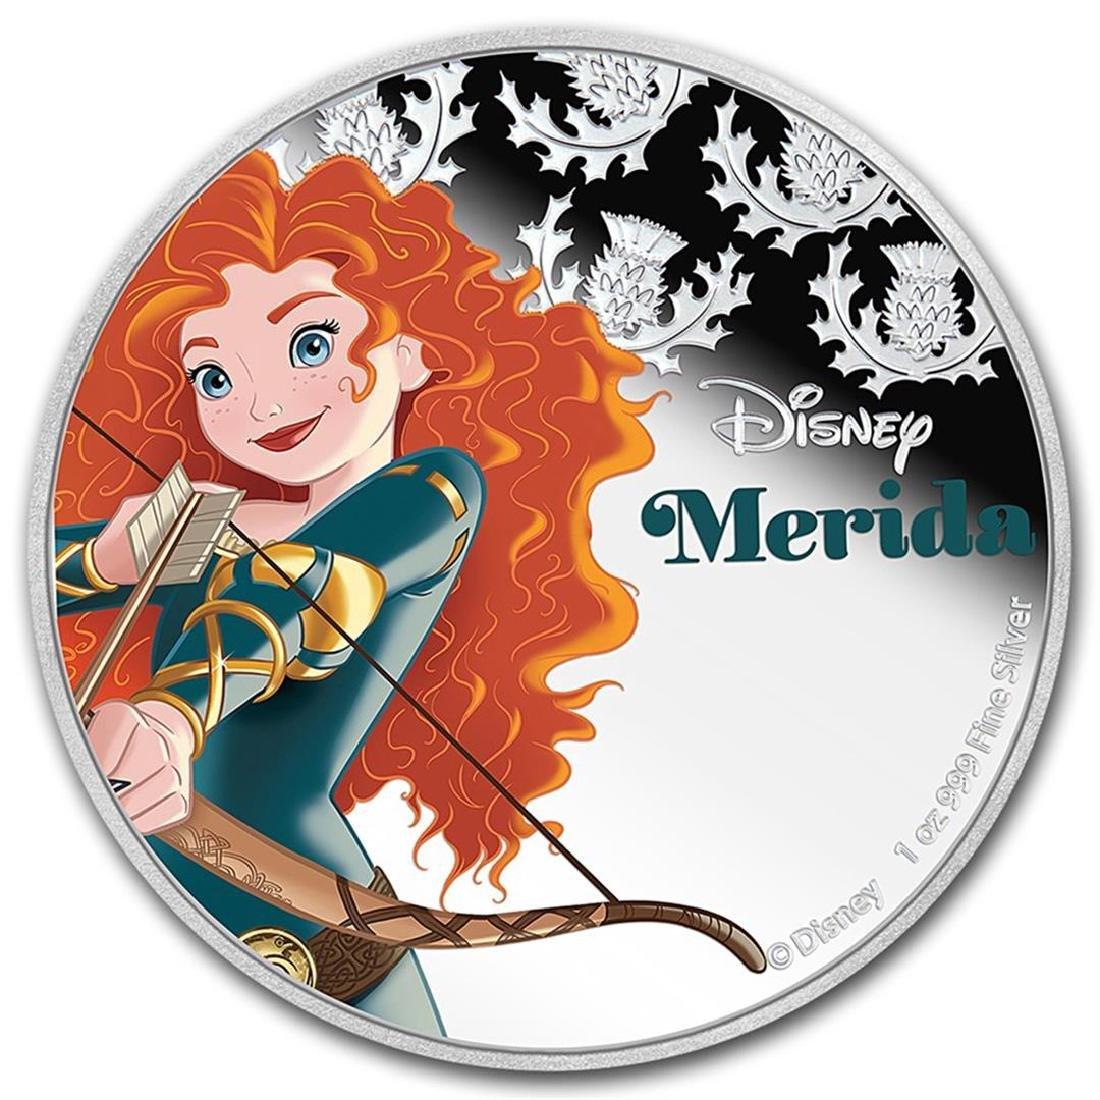 2016 $2 Disney Princess Merida .999 Fine Silver Proof